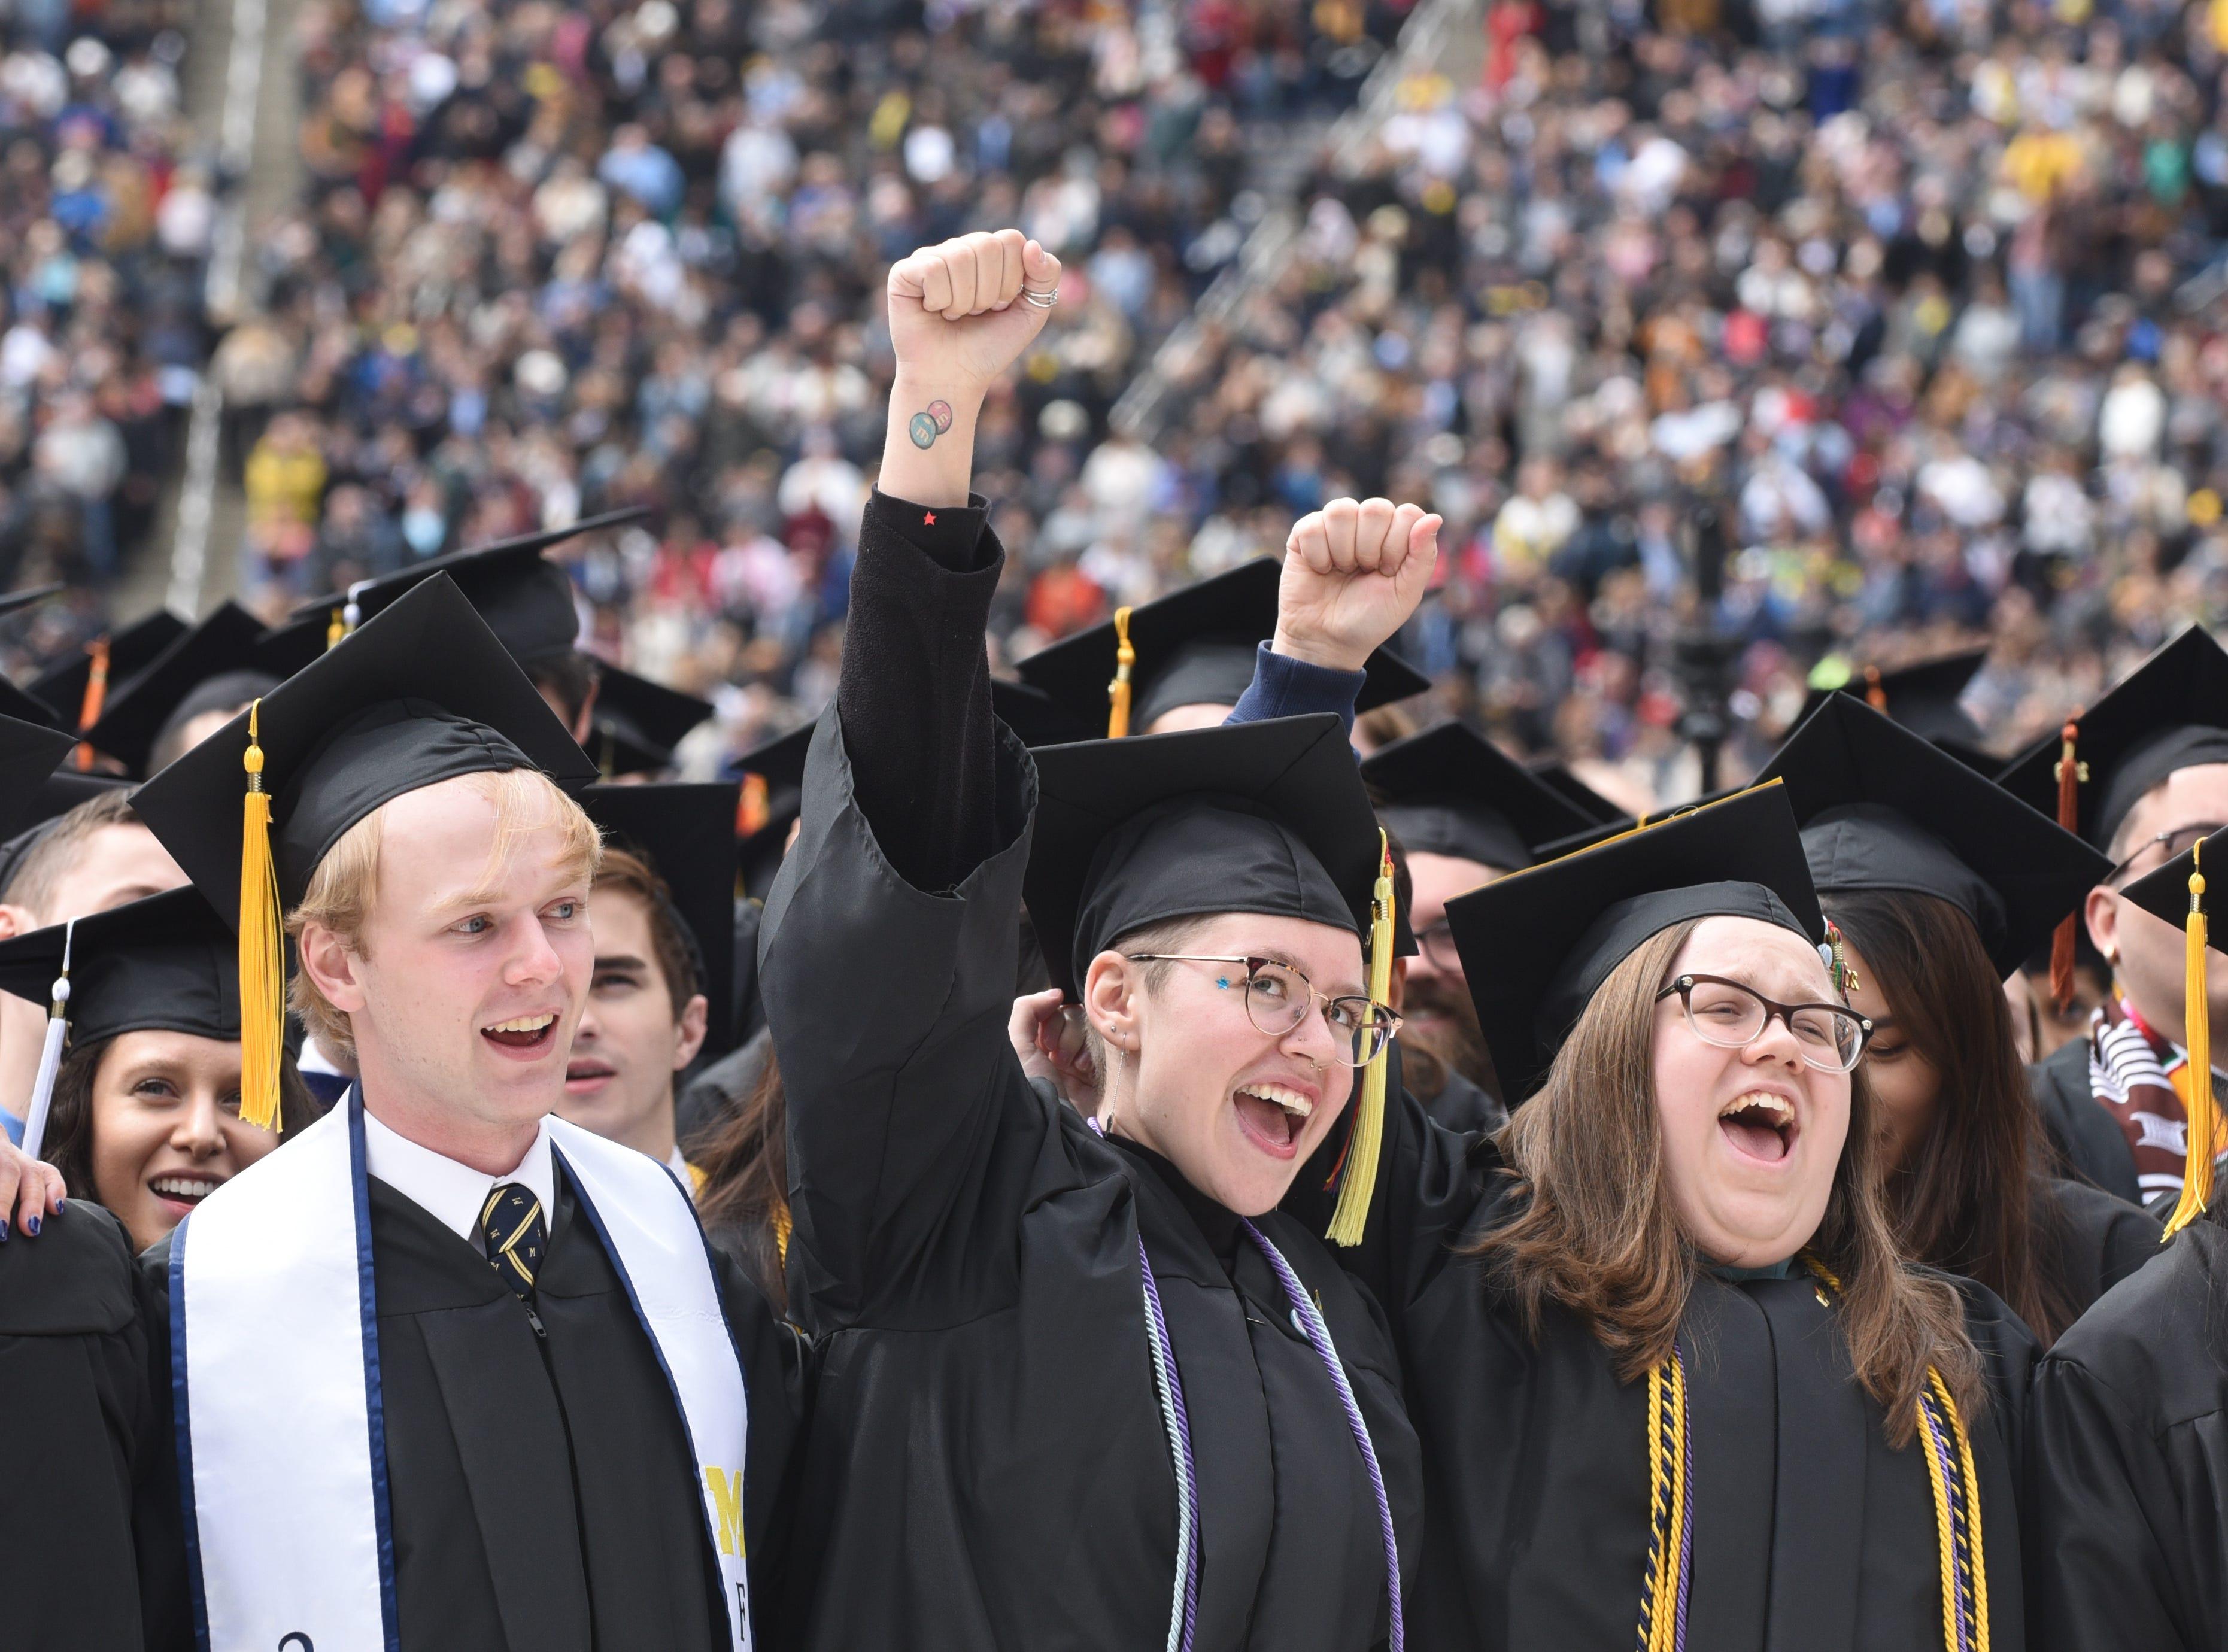 University of Michigan graduate Audra Christophersen (center) shouts 'go blue'.